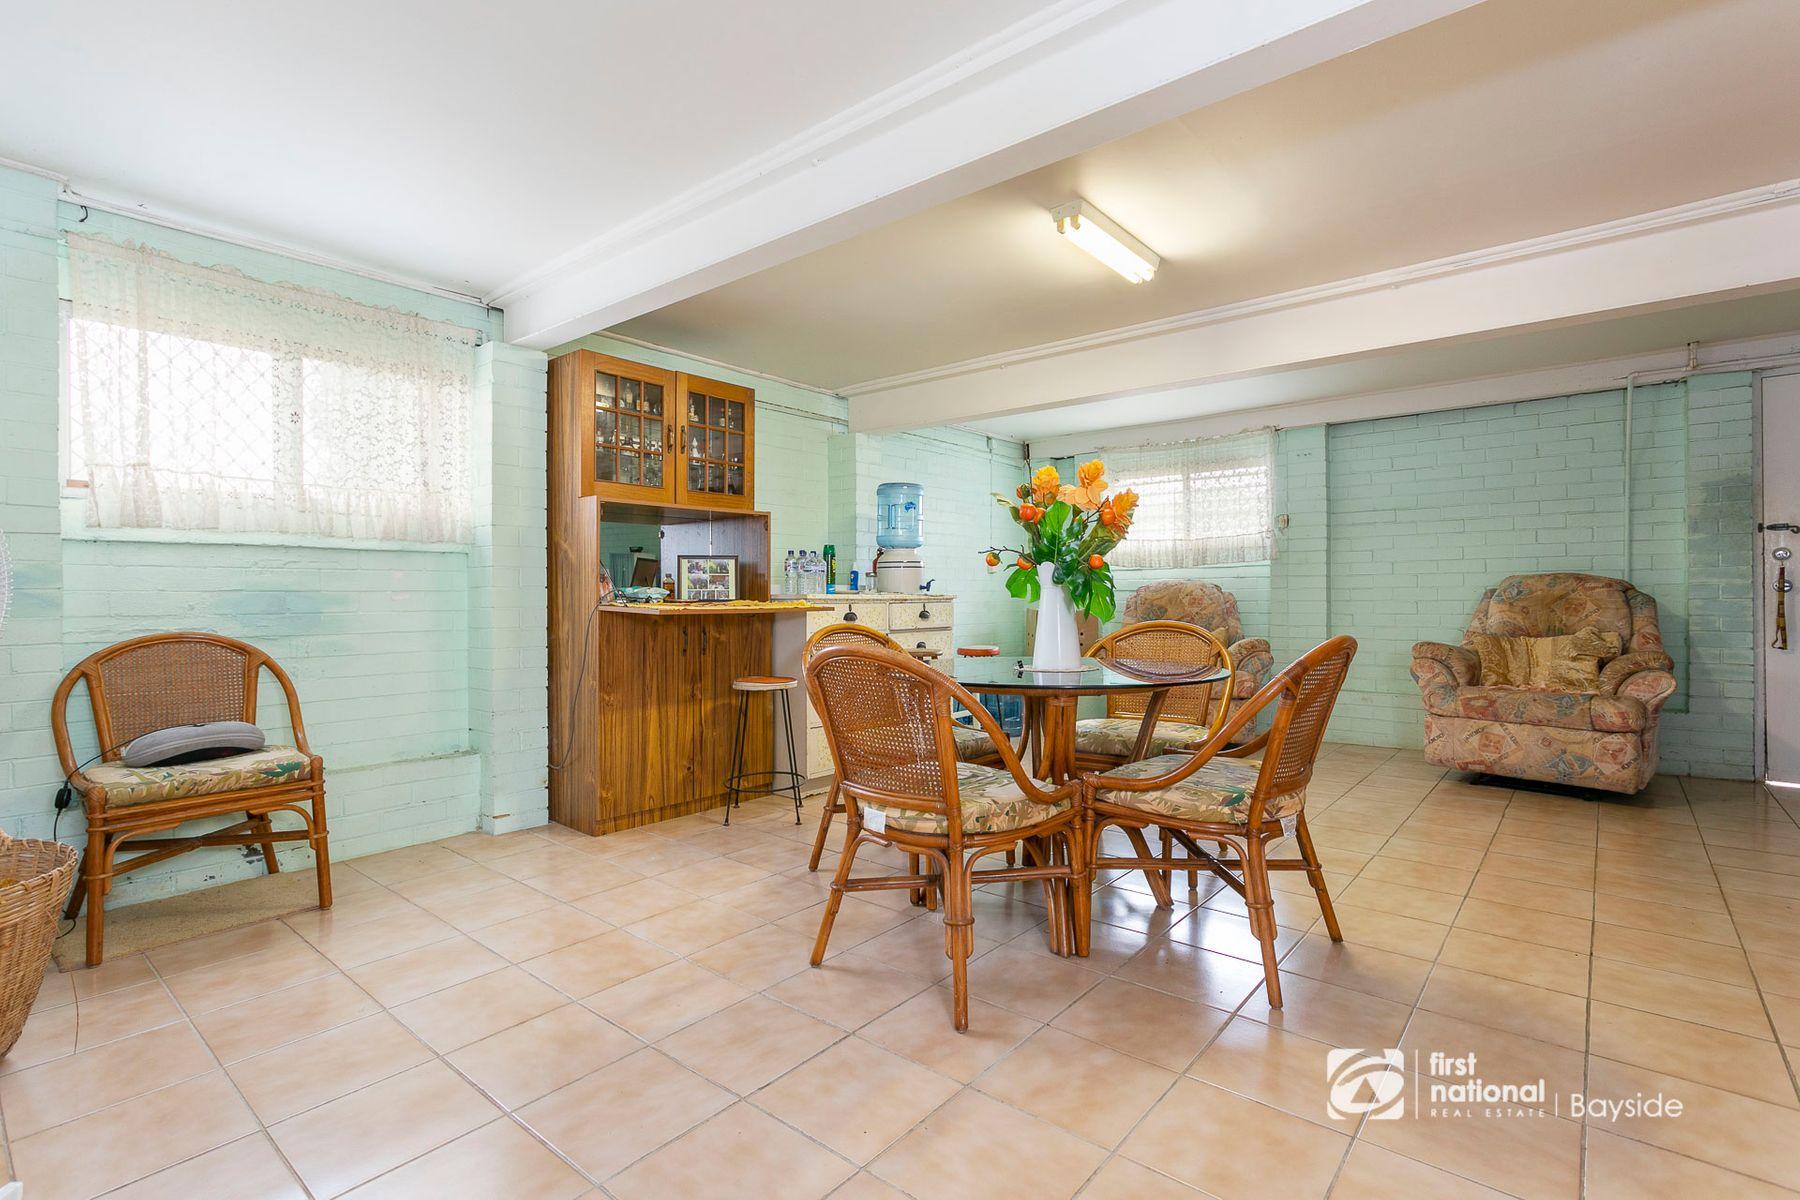 46-48 McWilliam Street, Redland Bay, QLD 4165